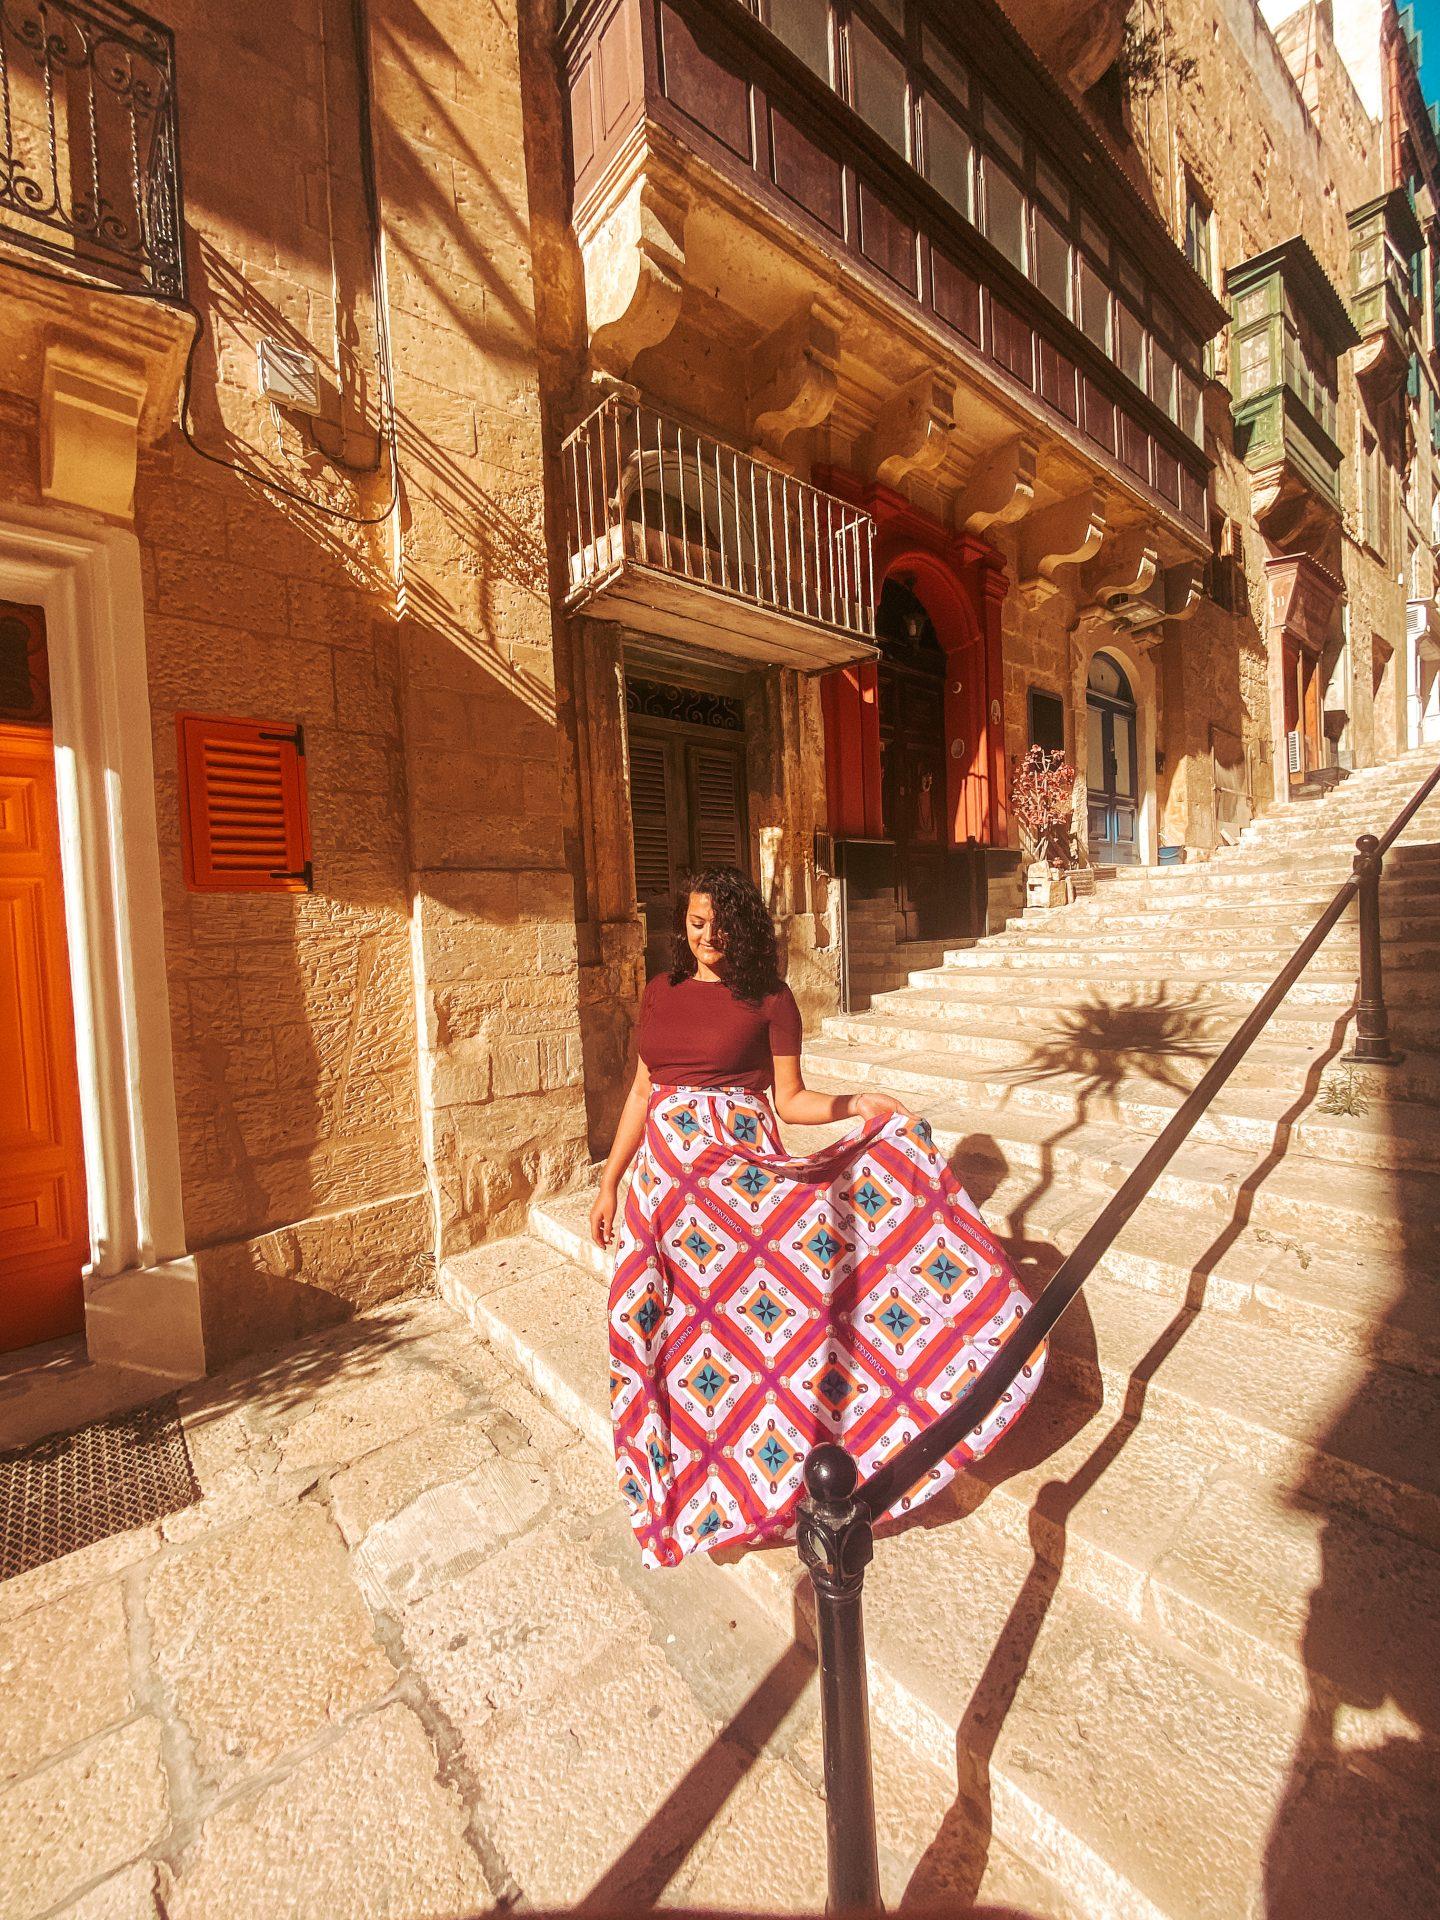 valletta-malta-side-streets-old